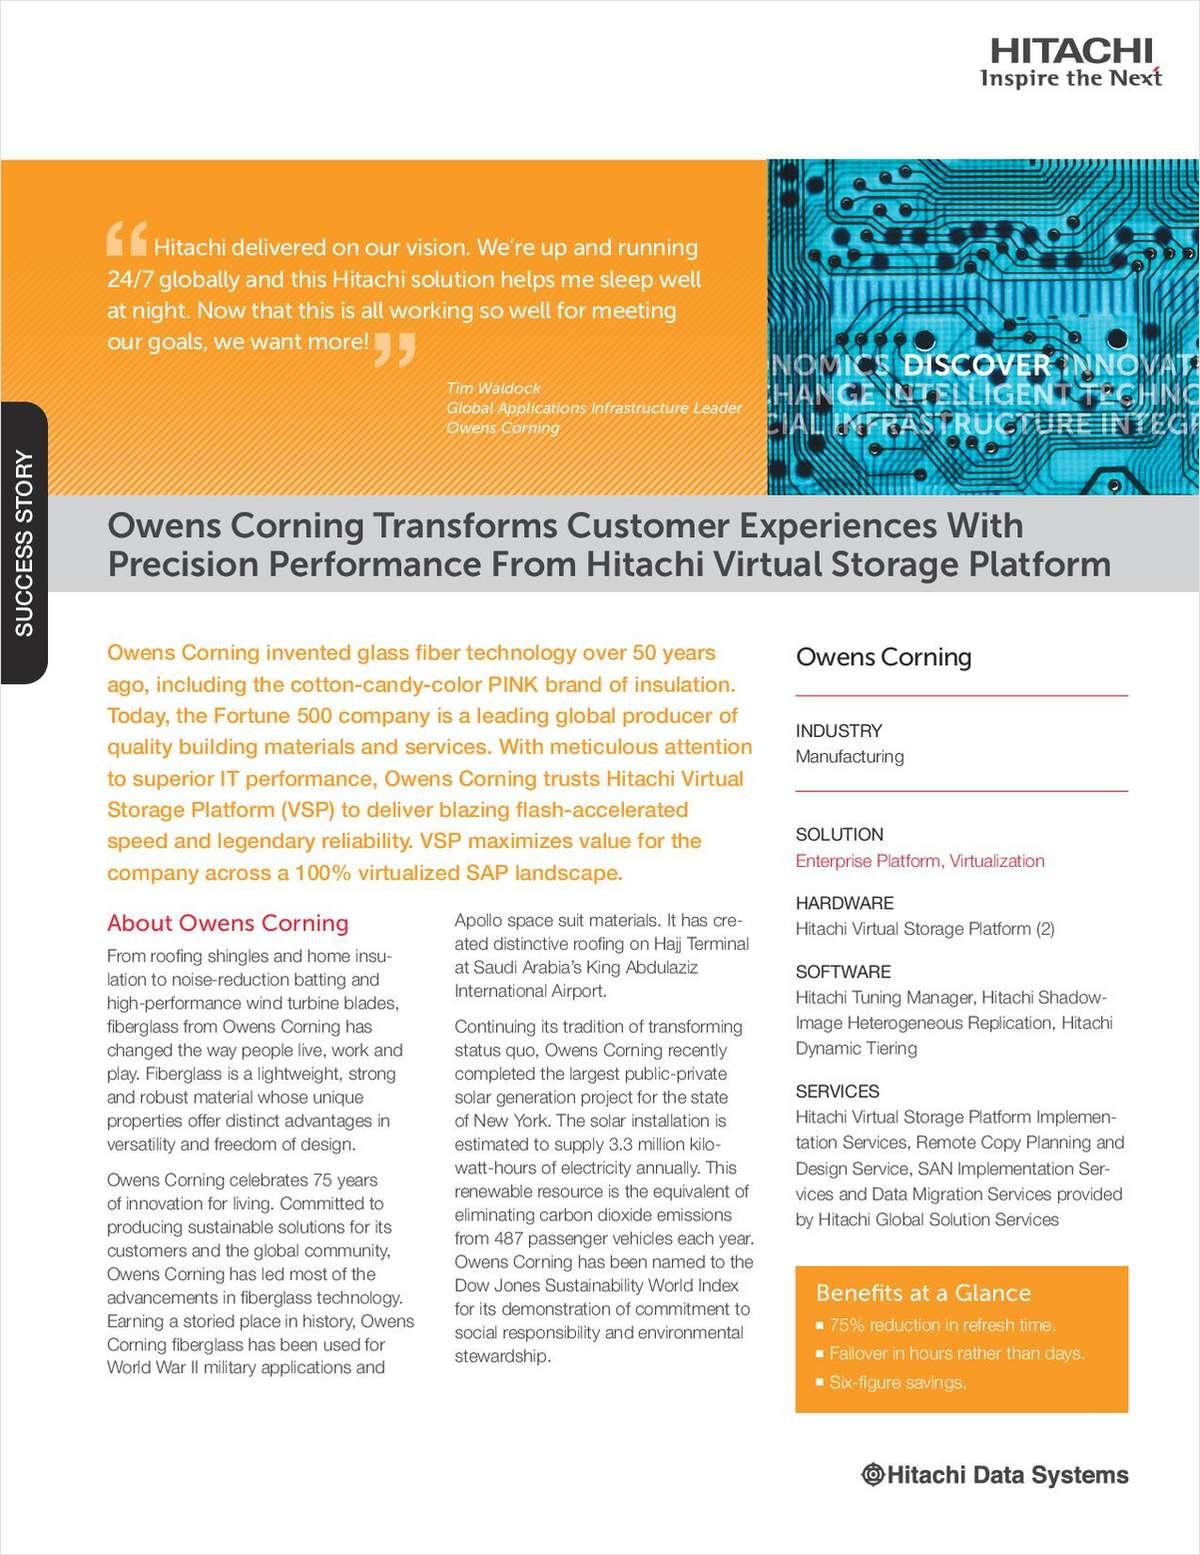 Owens Corning Transforms Customer Experiences With Precision Performance From Hitachi Virtual Storage Platform